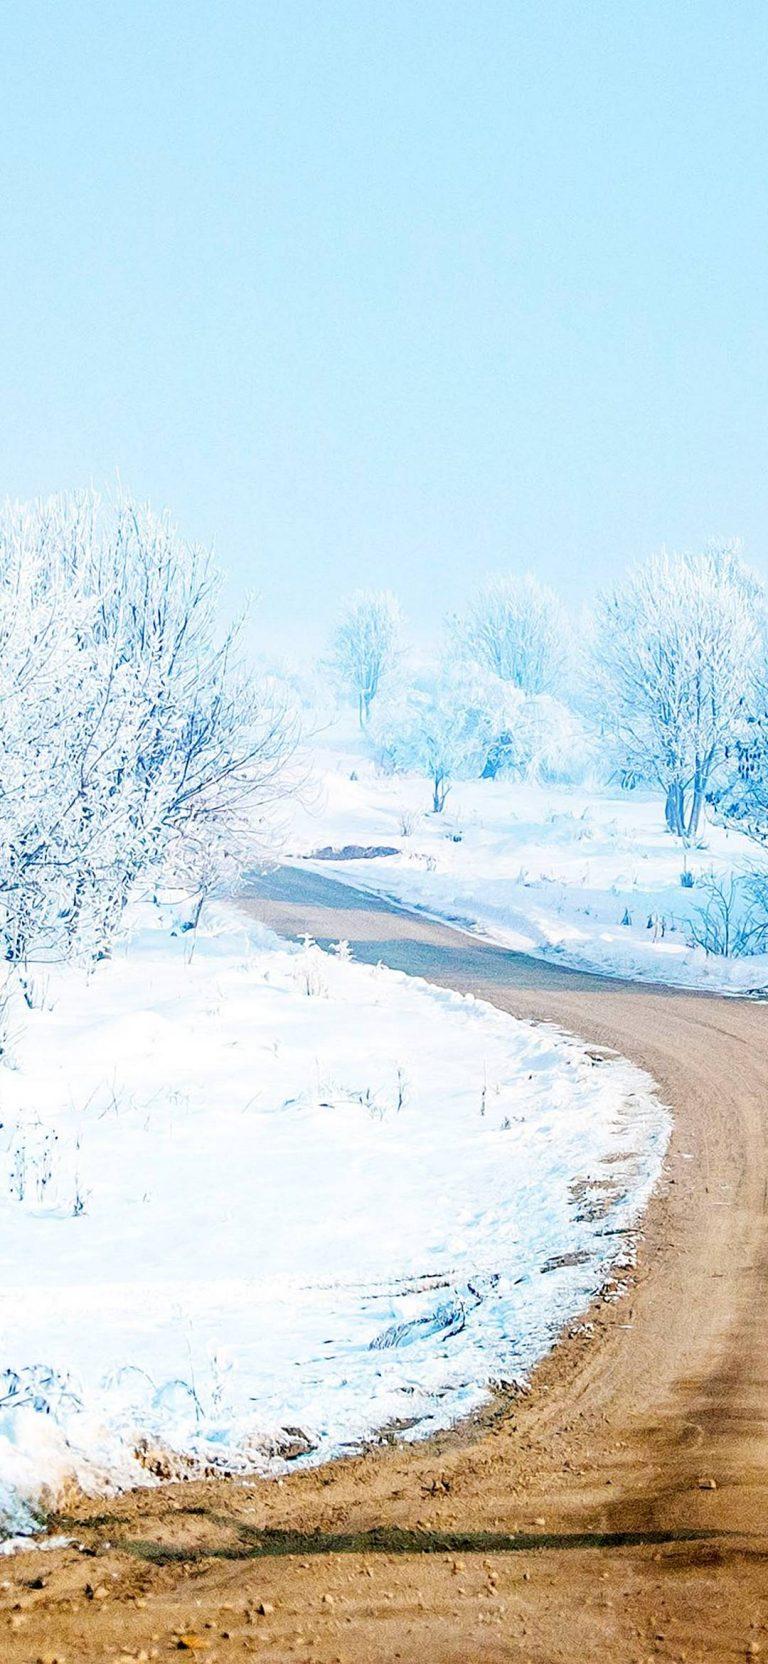 Snow Way 1080x2340 768x1664